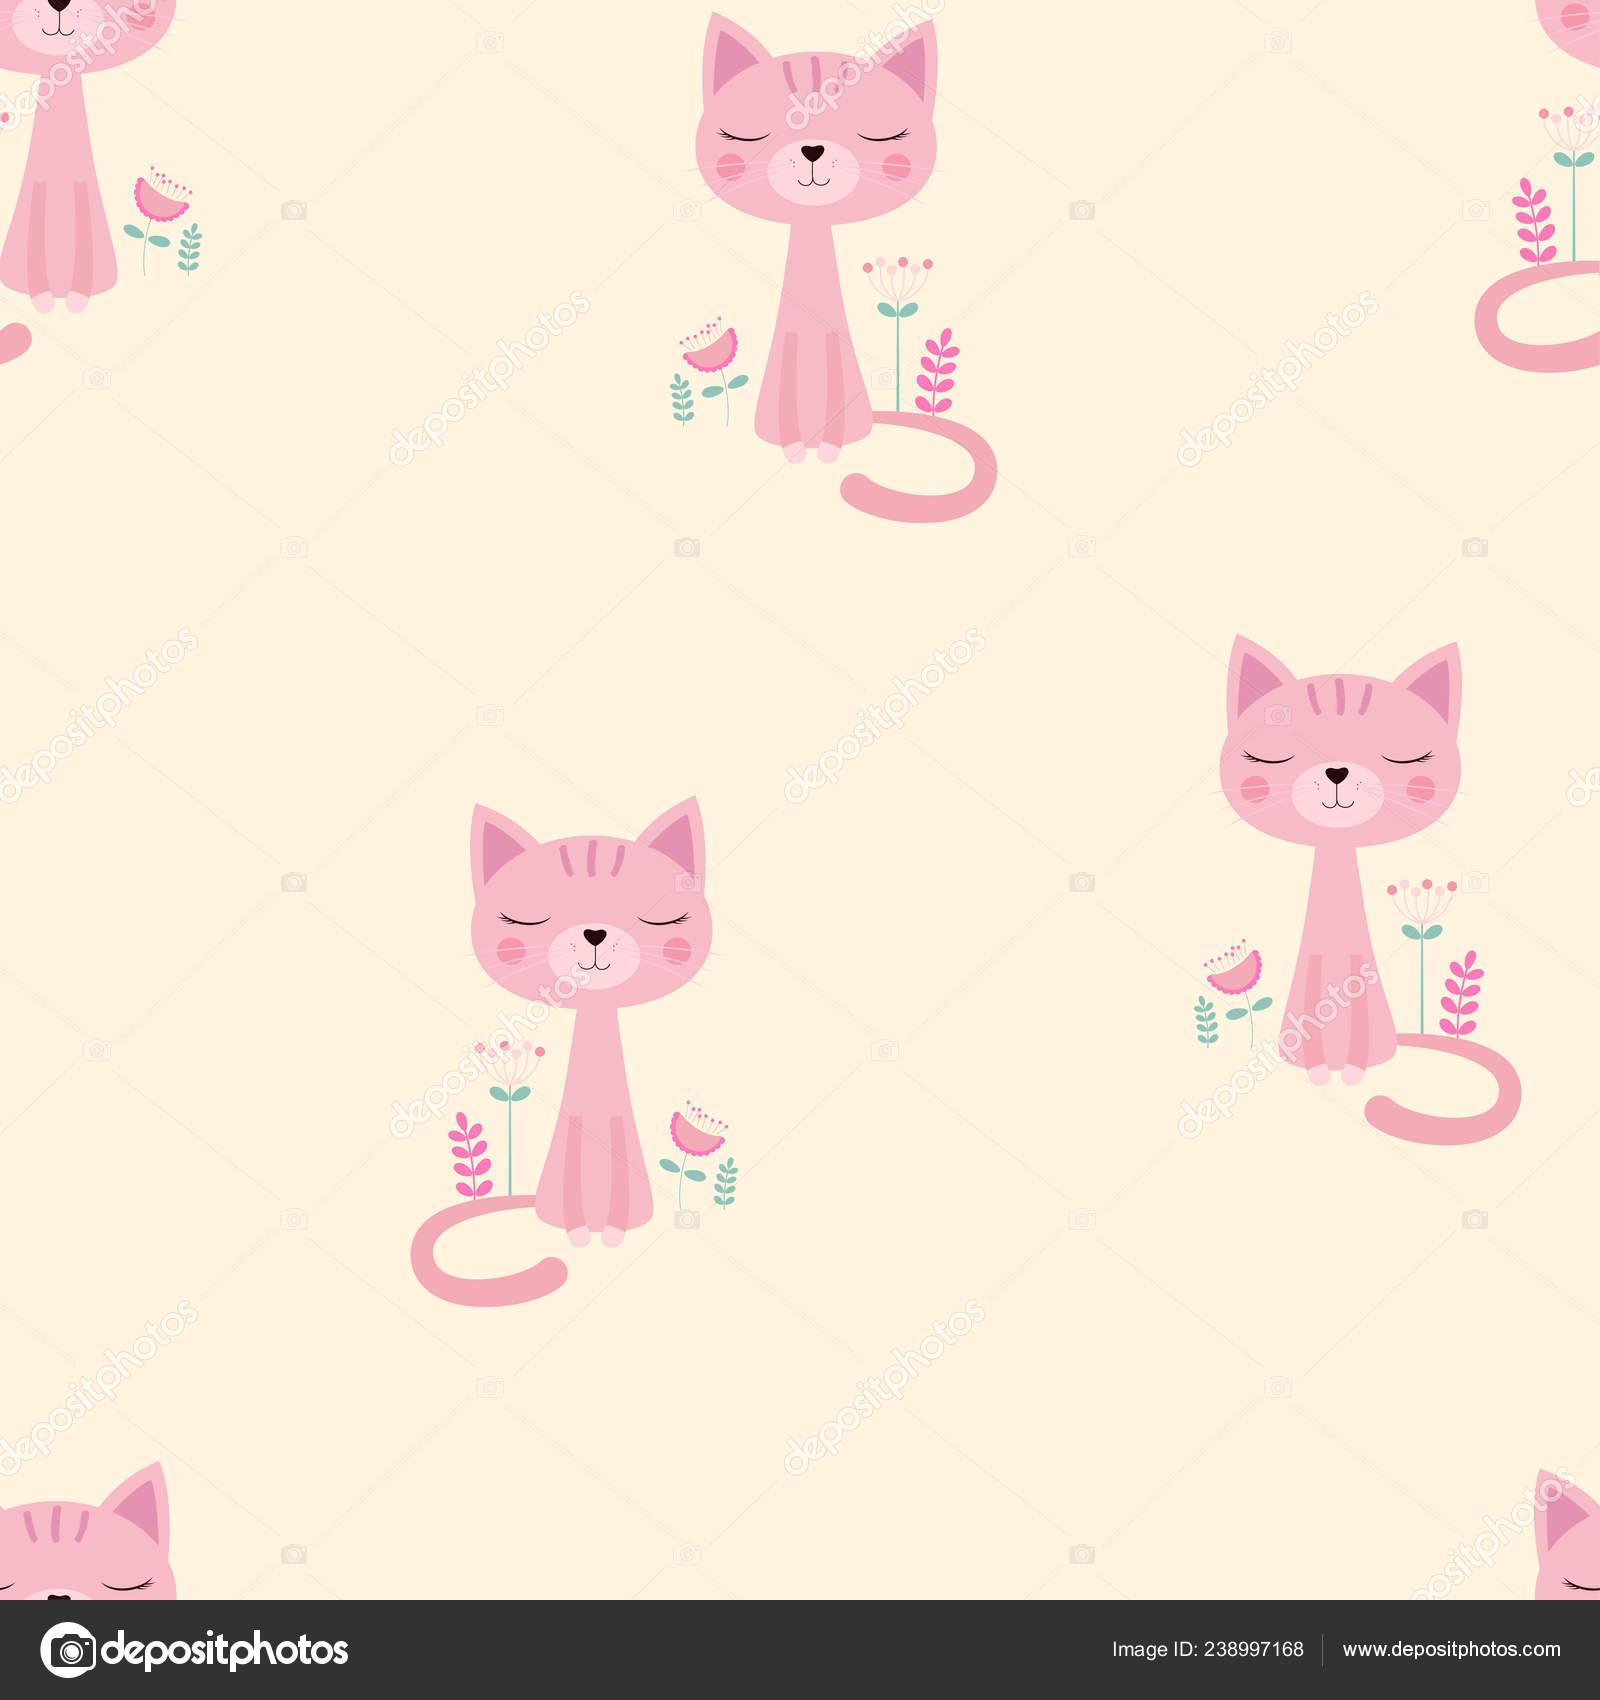 Cute Pink Cat Wallpaper Pattern Cute Pink Cat Flowers Beige Bacground Design Print Wallpaper Stock Vector C Makc76 238997168